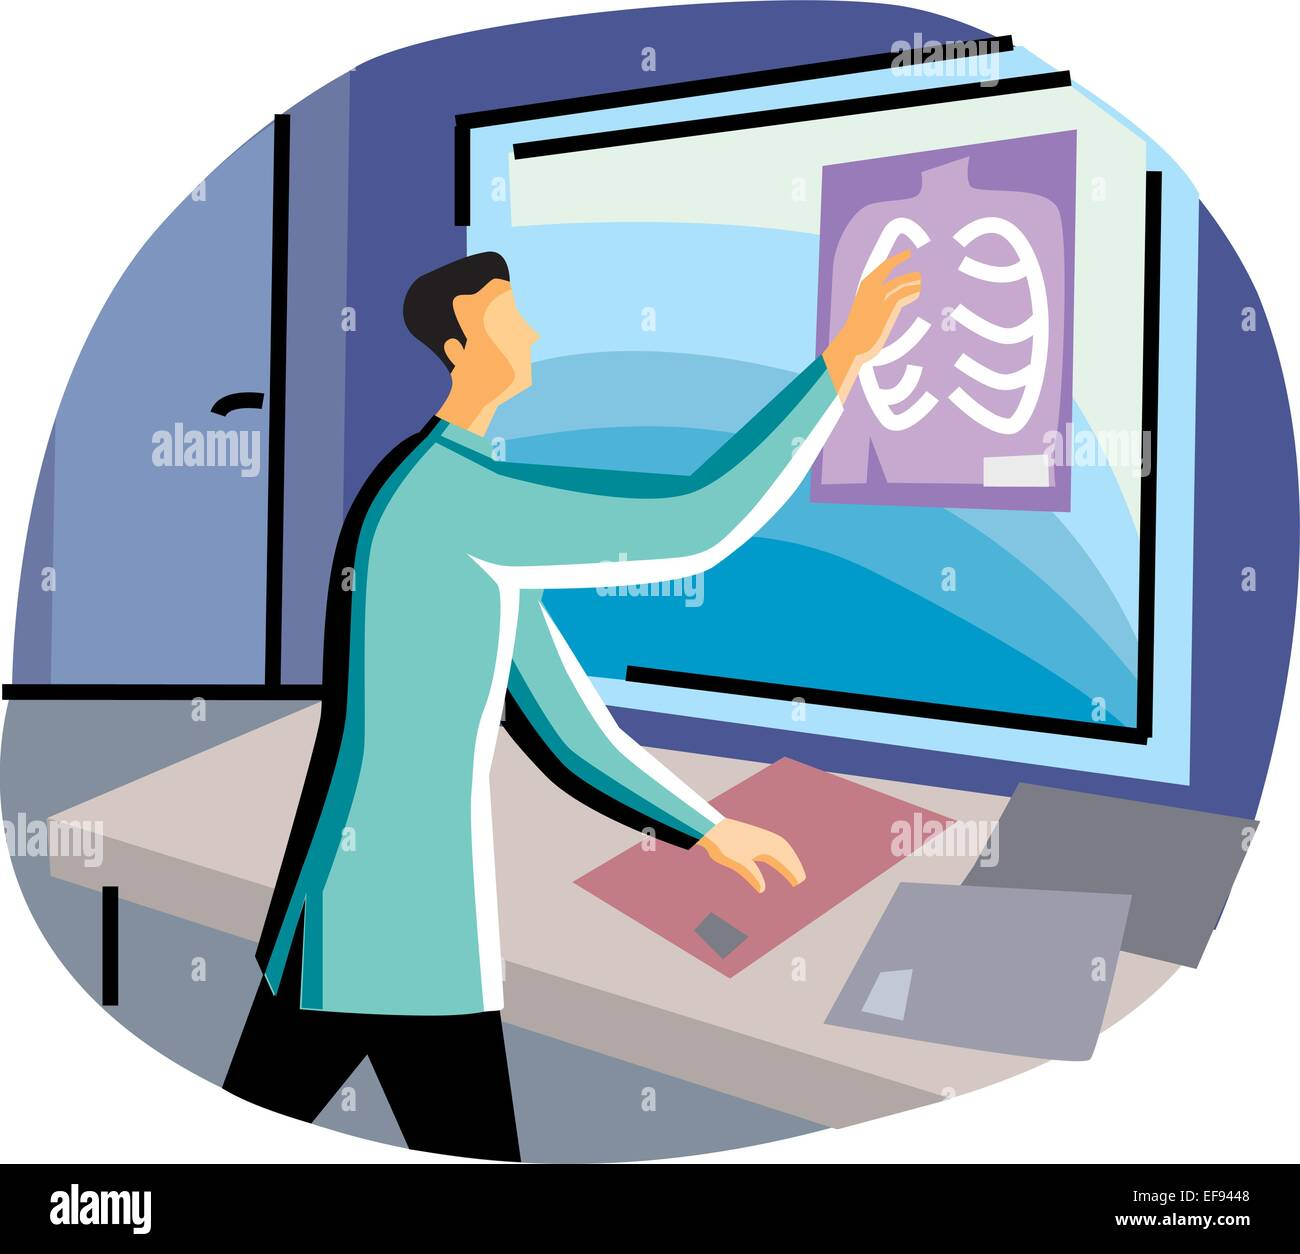 Doctor Examining X-Ray - Stock Vector